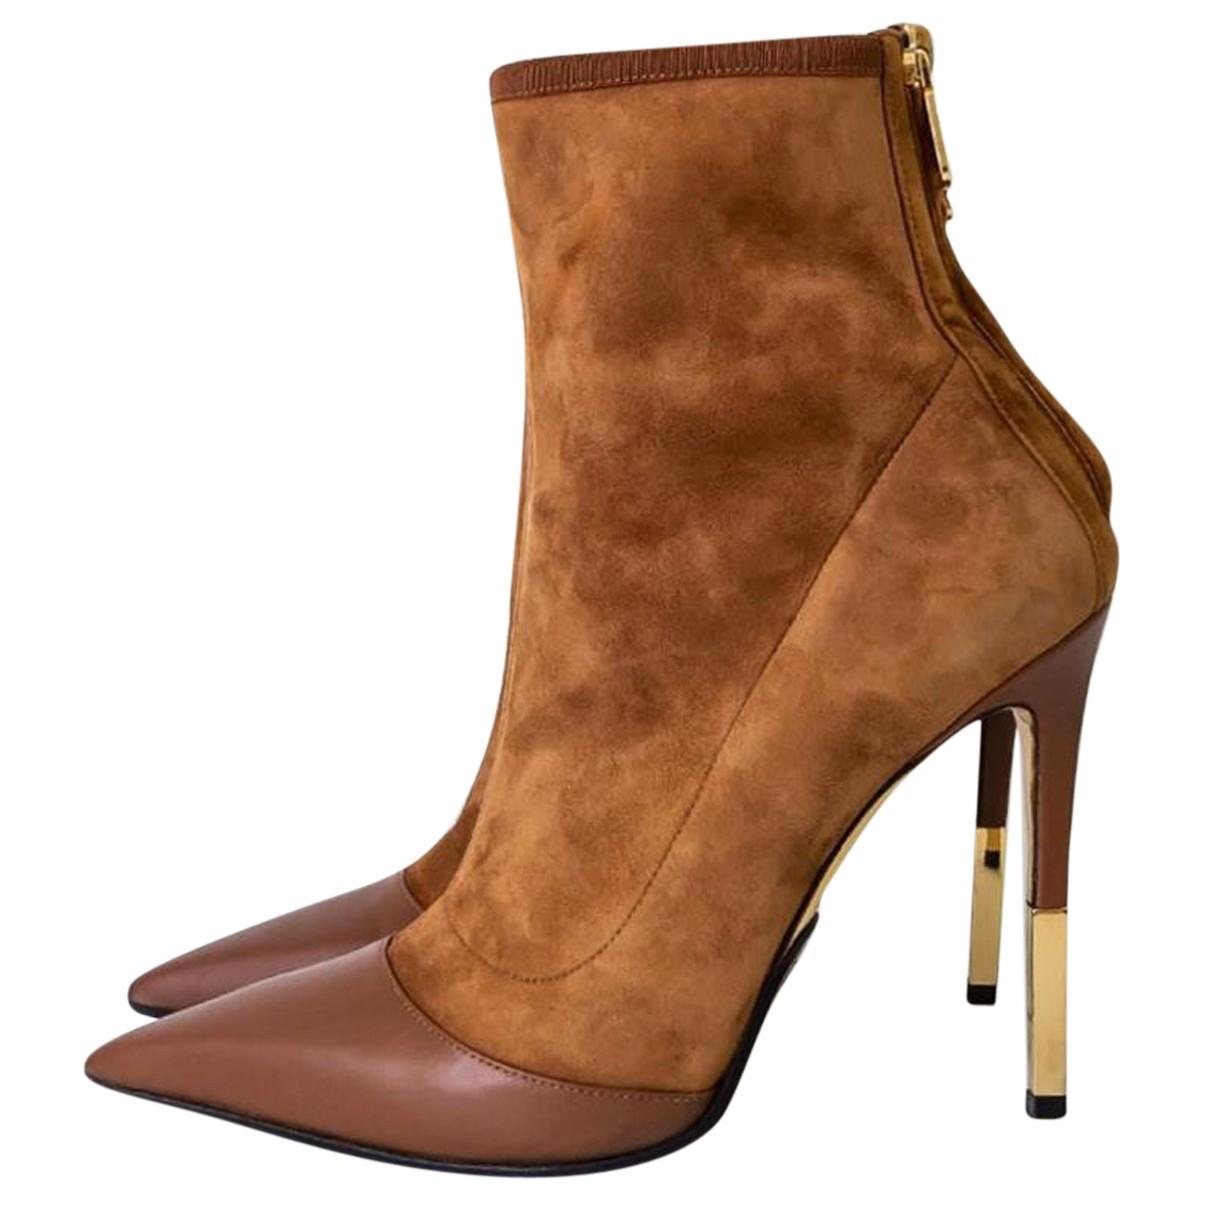 Balmain N Brown Suede Ankle boots for Women 39 EU